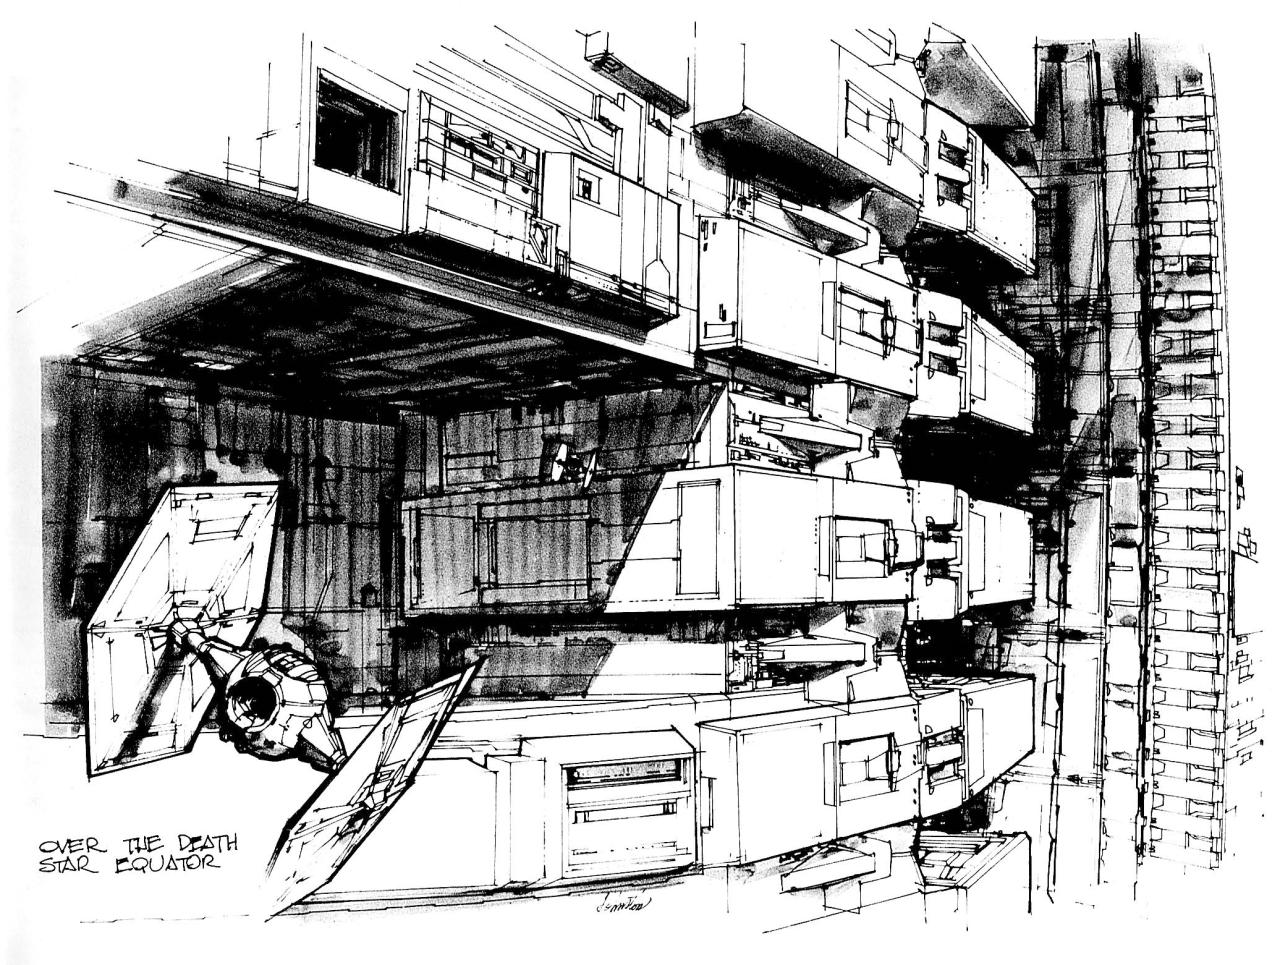 Death Star concept art by Joe Johnston, 1975-1976. | Raiders of the Lost Tumblr